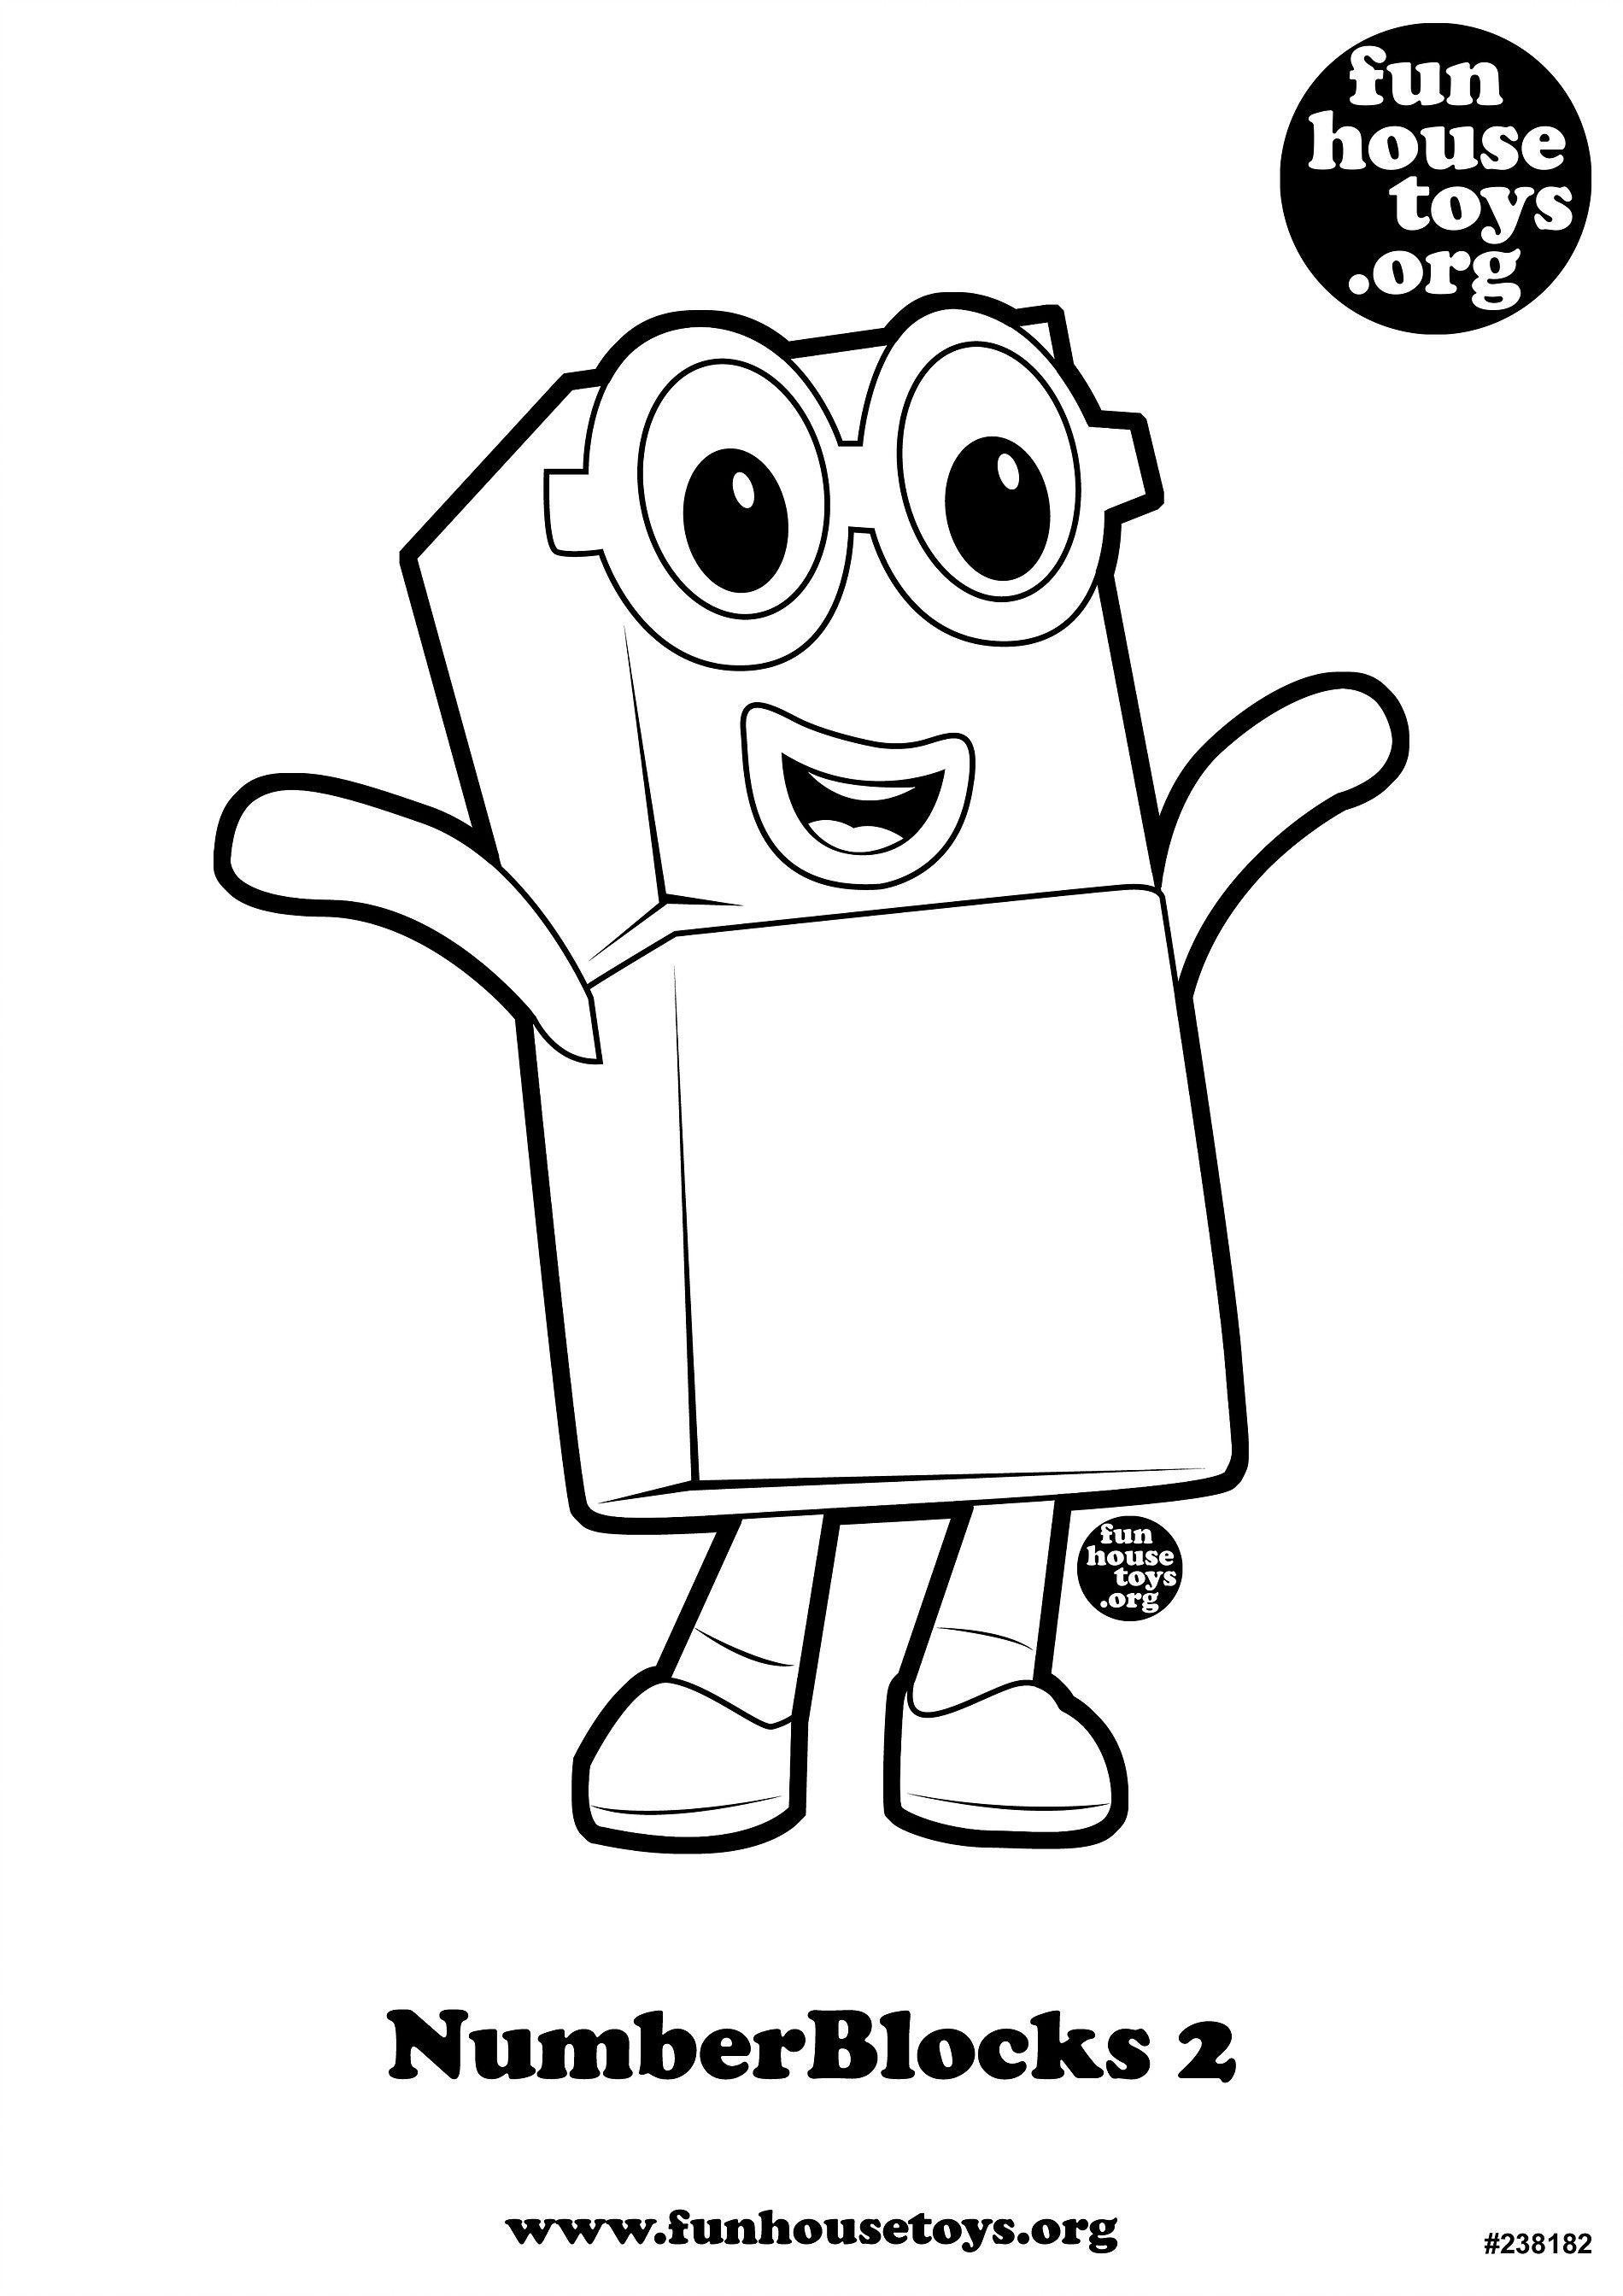 Numberblocks 2 Printable Coloring Book Kids Printable Coloring Pages Coloring Pages